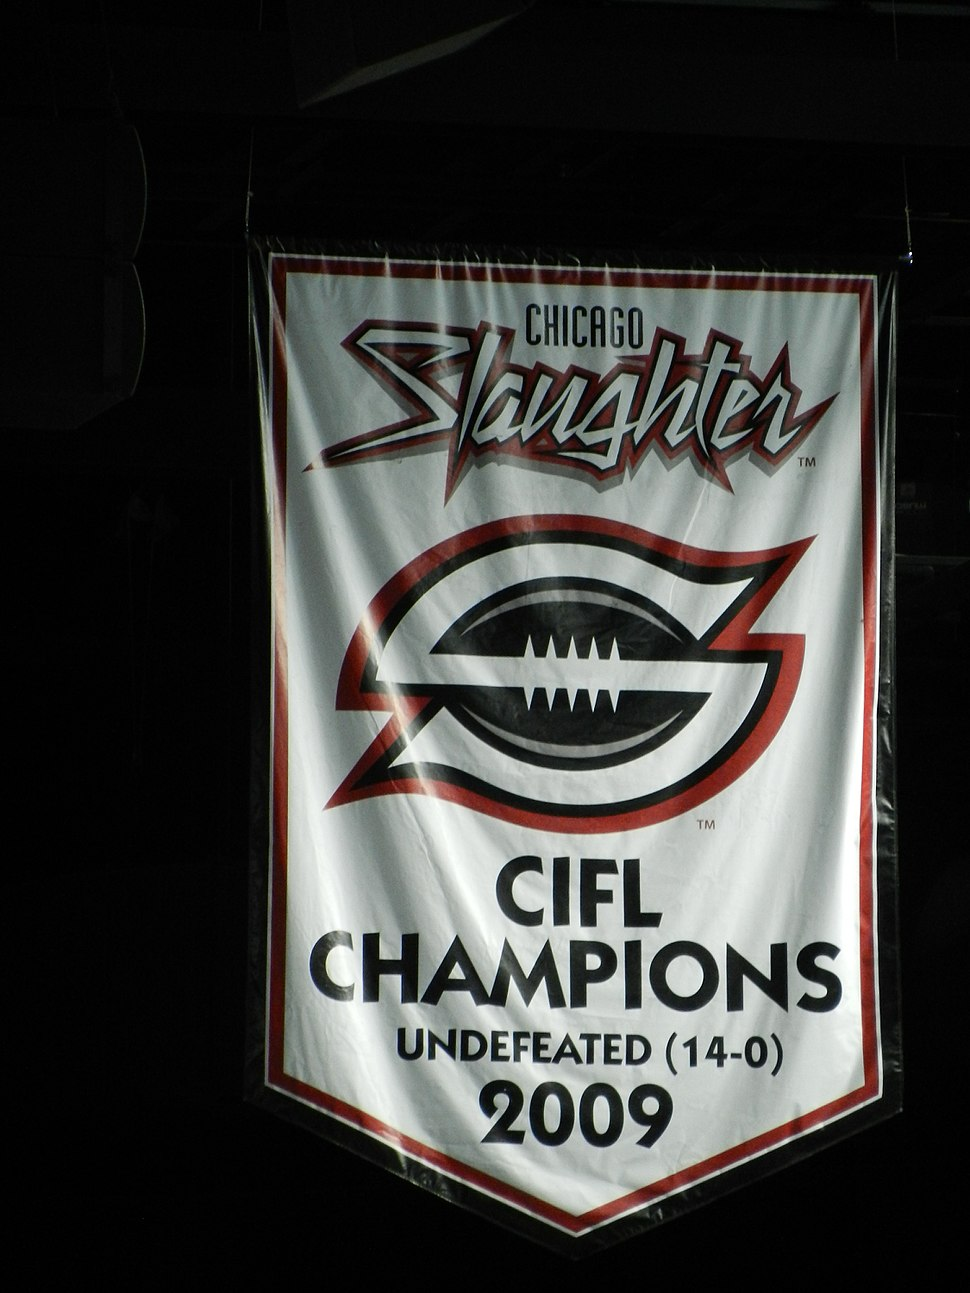 Chicago Slaughter 2009 Champs Banner